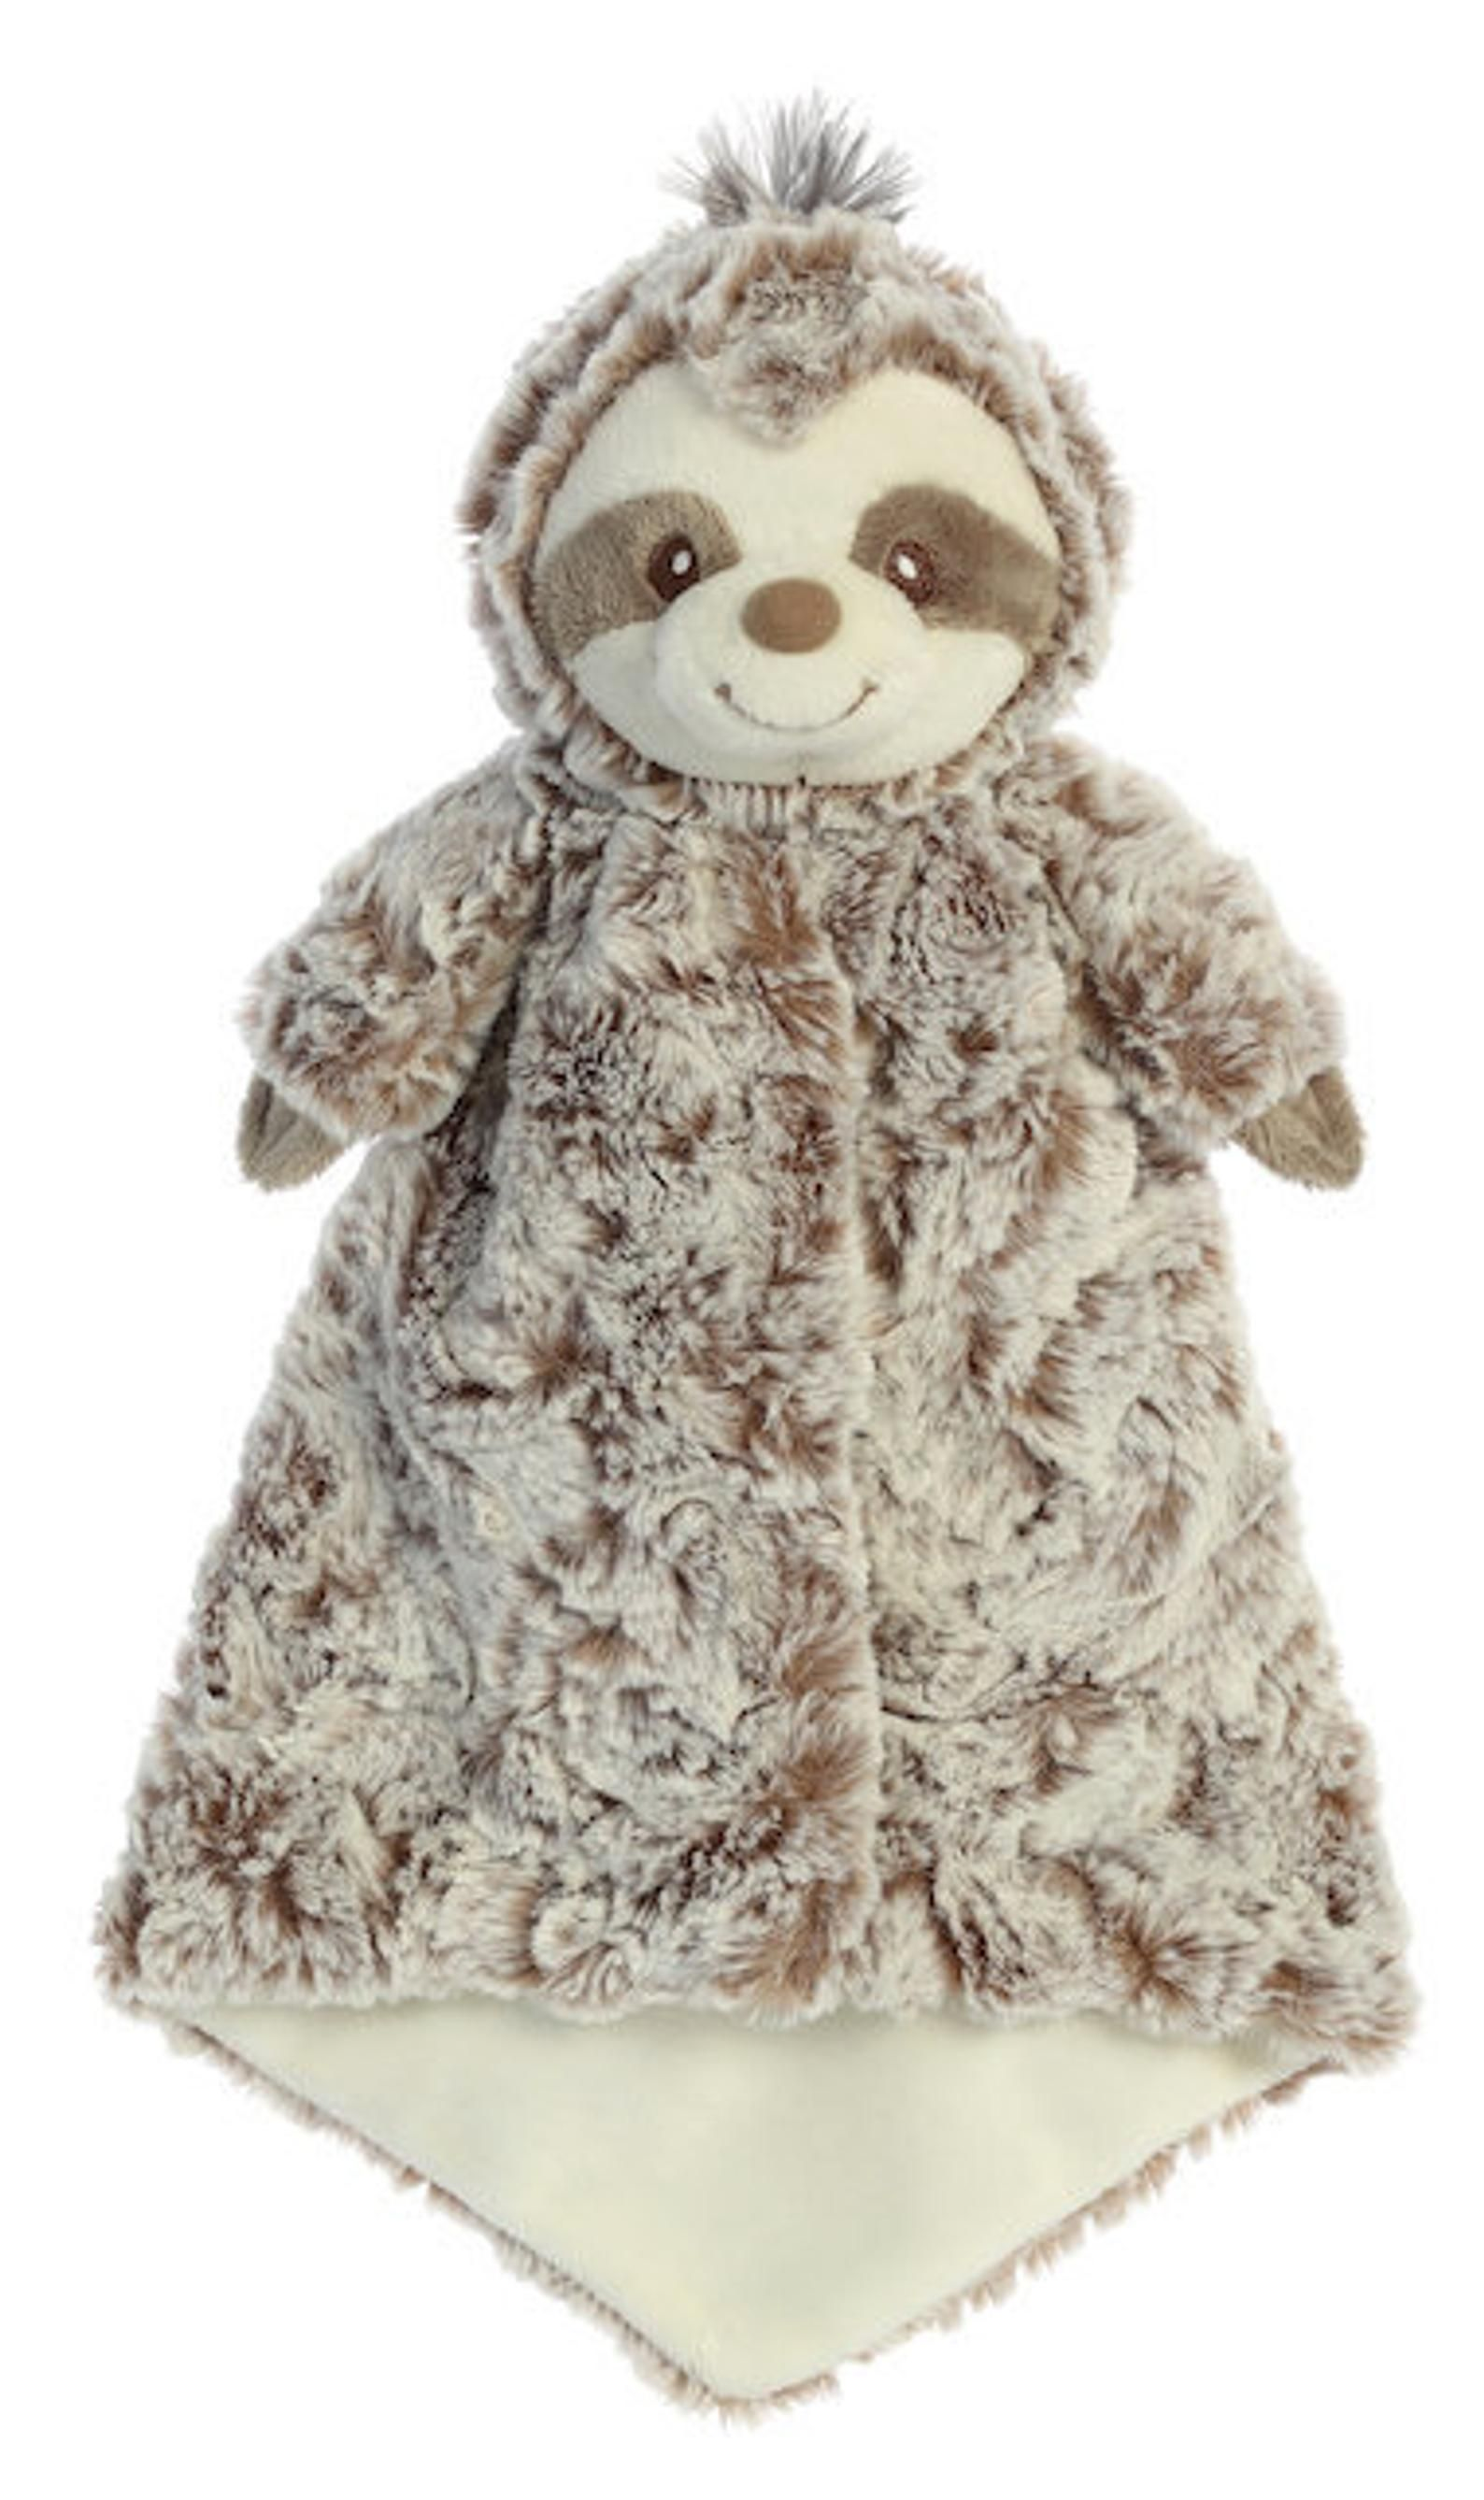 Personalised Teddy Bear Baby Soft Comforter Snuggle Blanket Gift Newborn Blankie